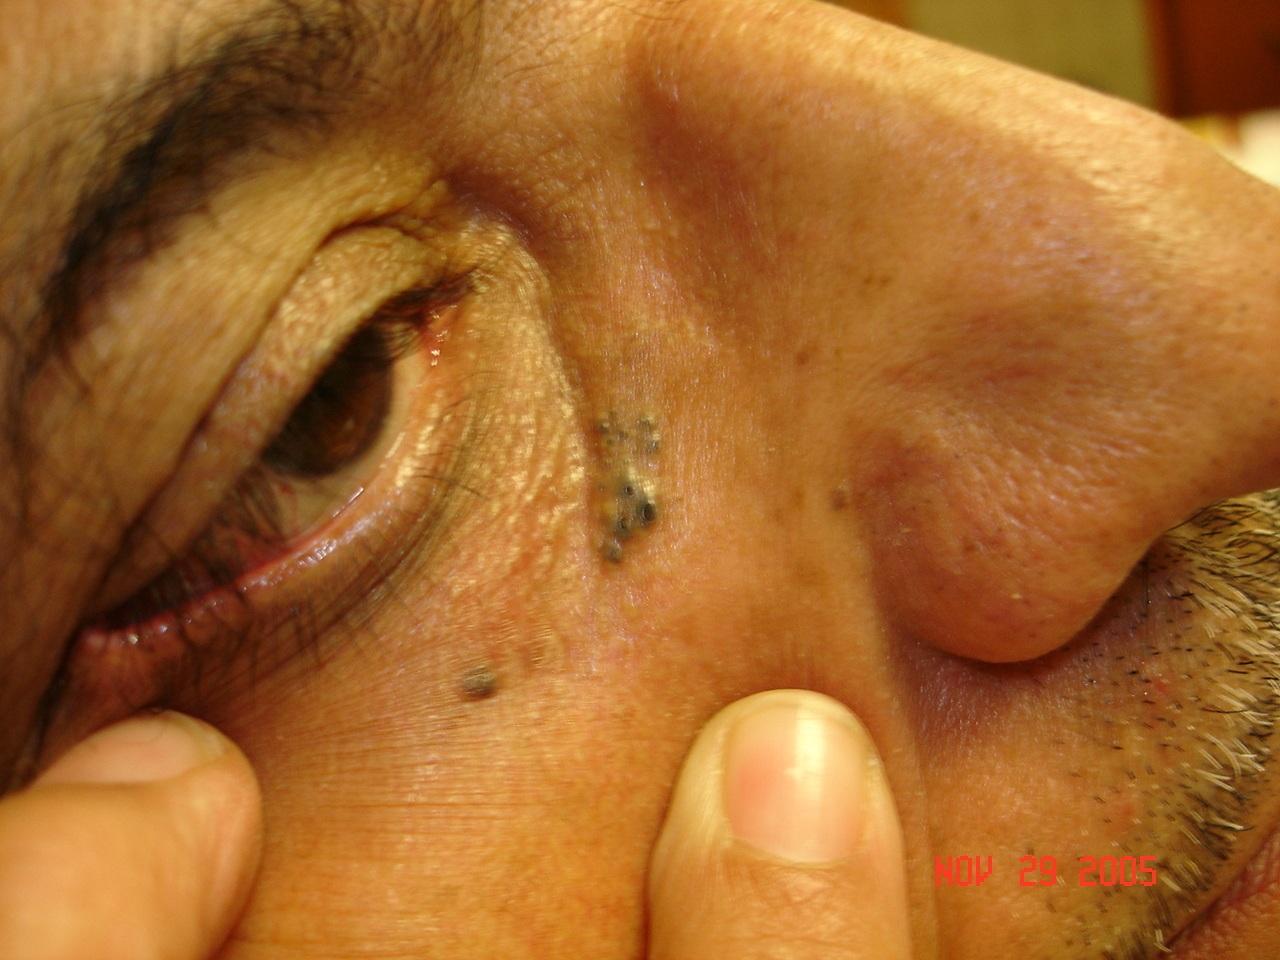 Skin imperfections under eye